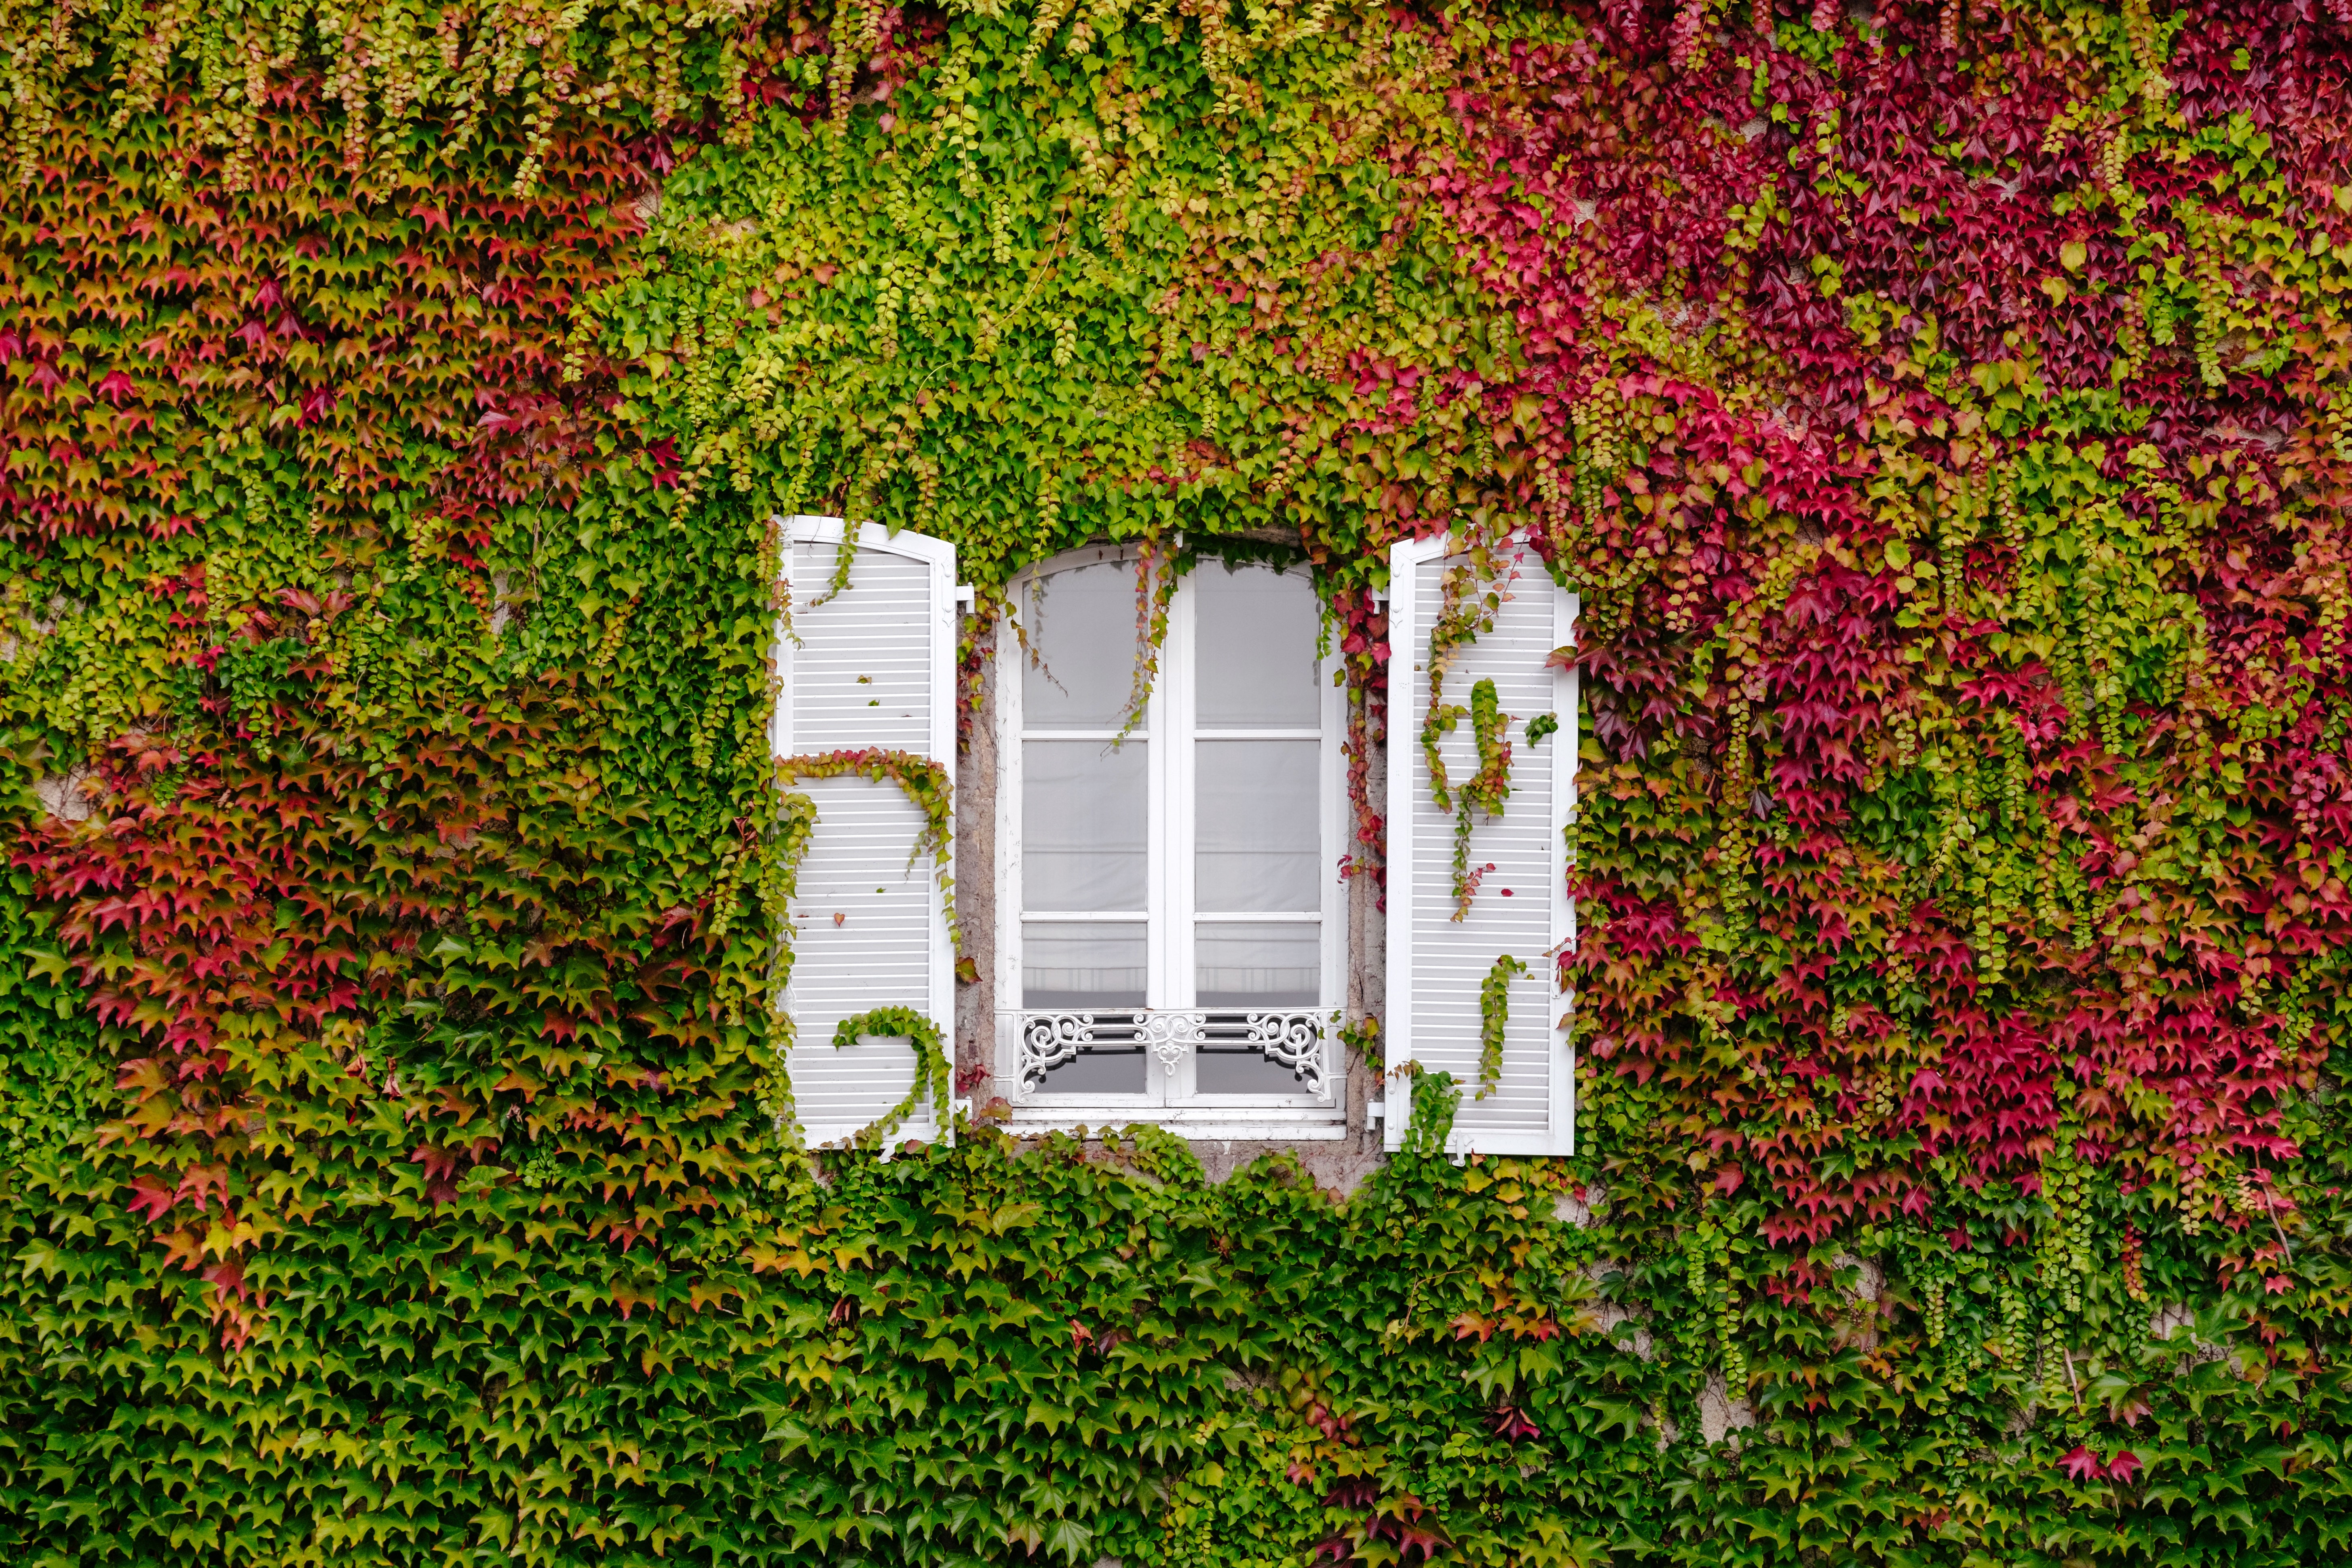 A window into Europe / Samuel Zeller (Unsplash)